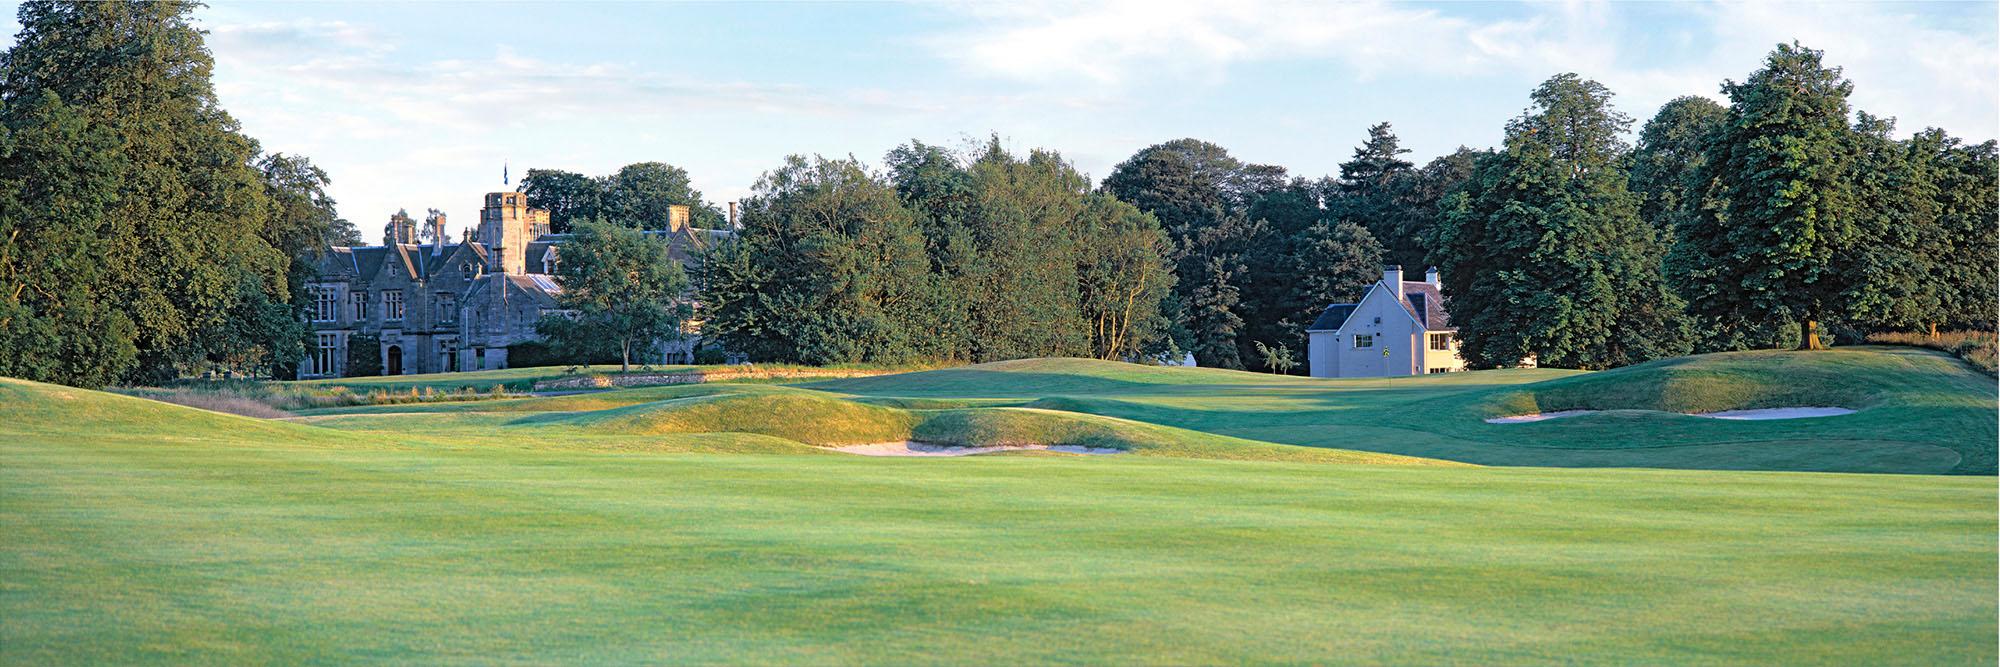 Golf Course Image - Roxburghe No. 18